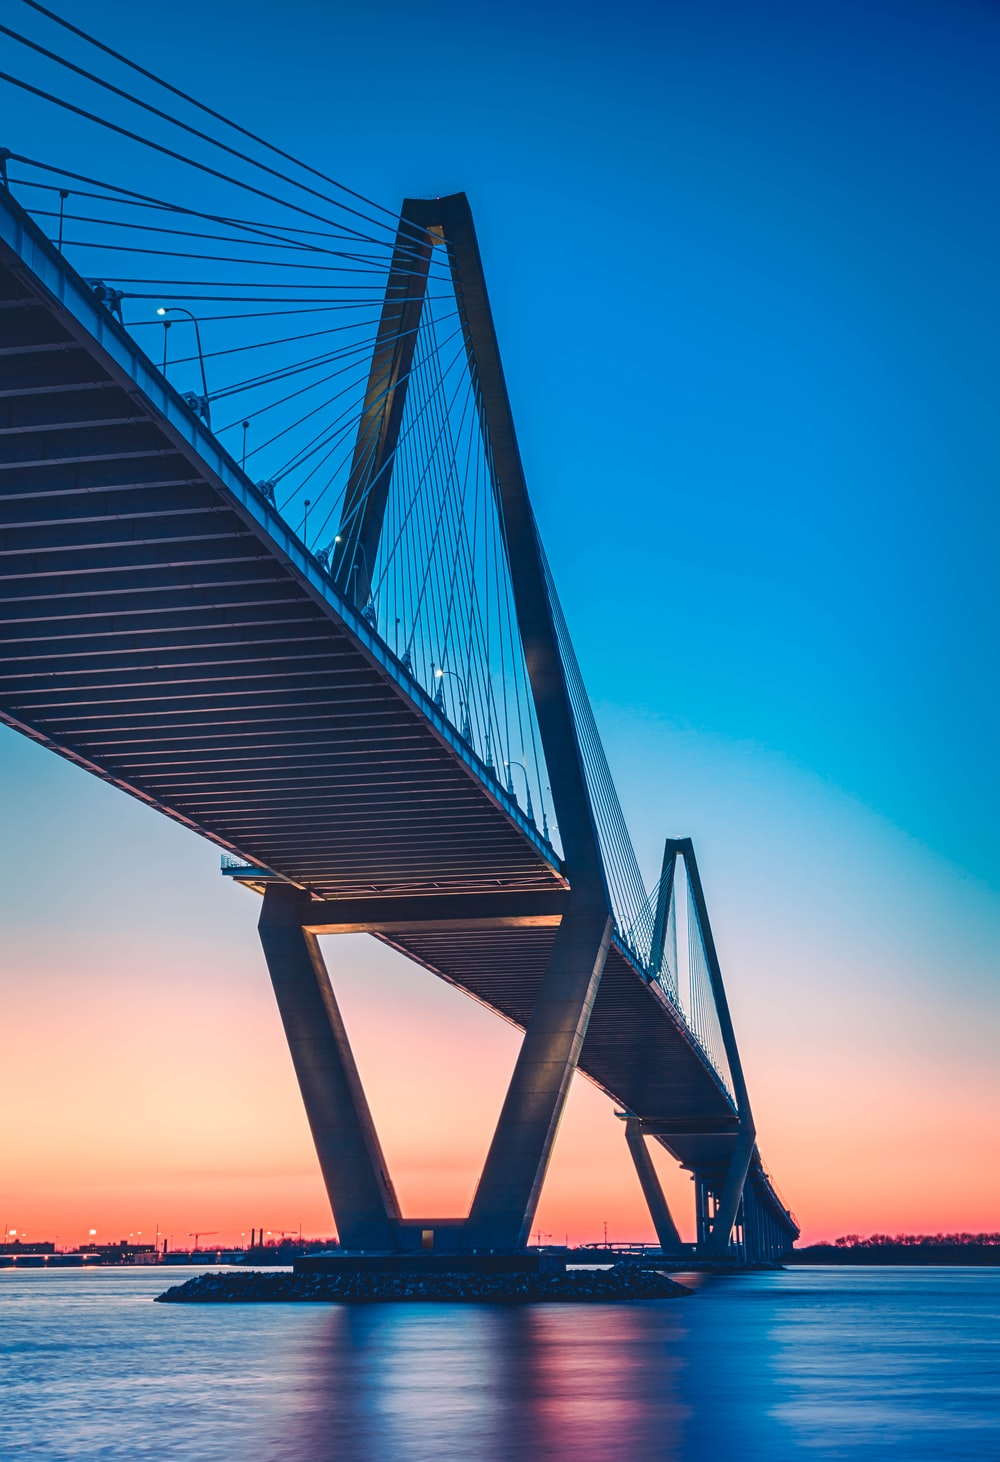 black bridge under blue sky during sunset